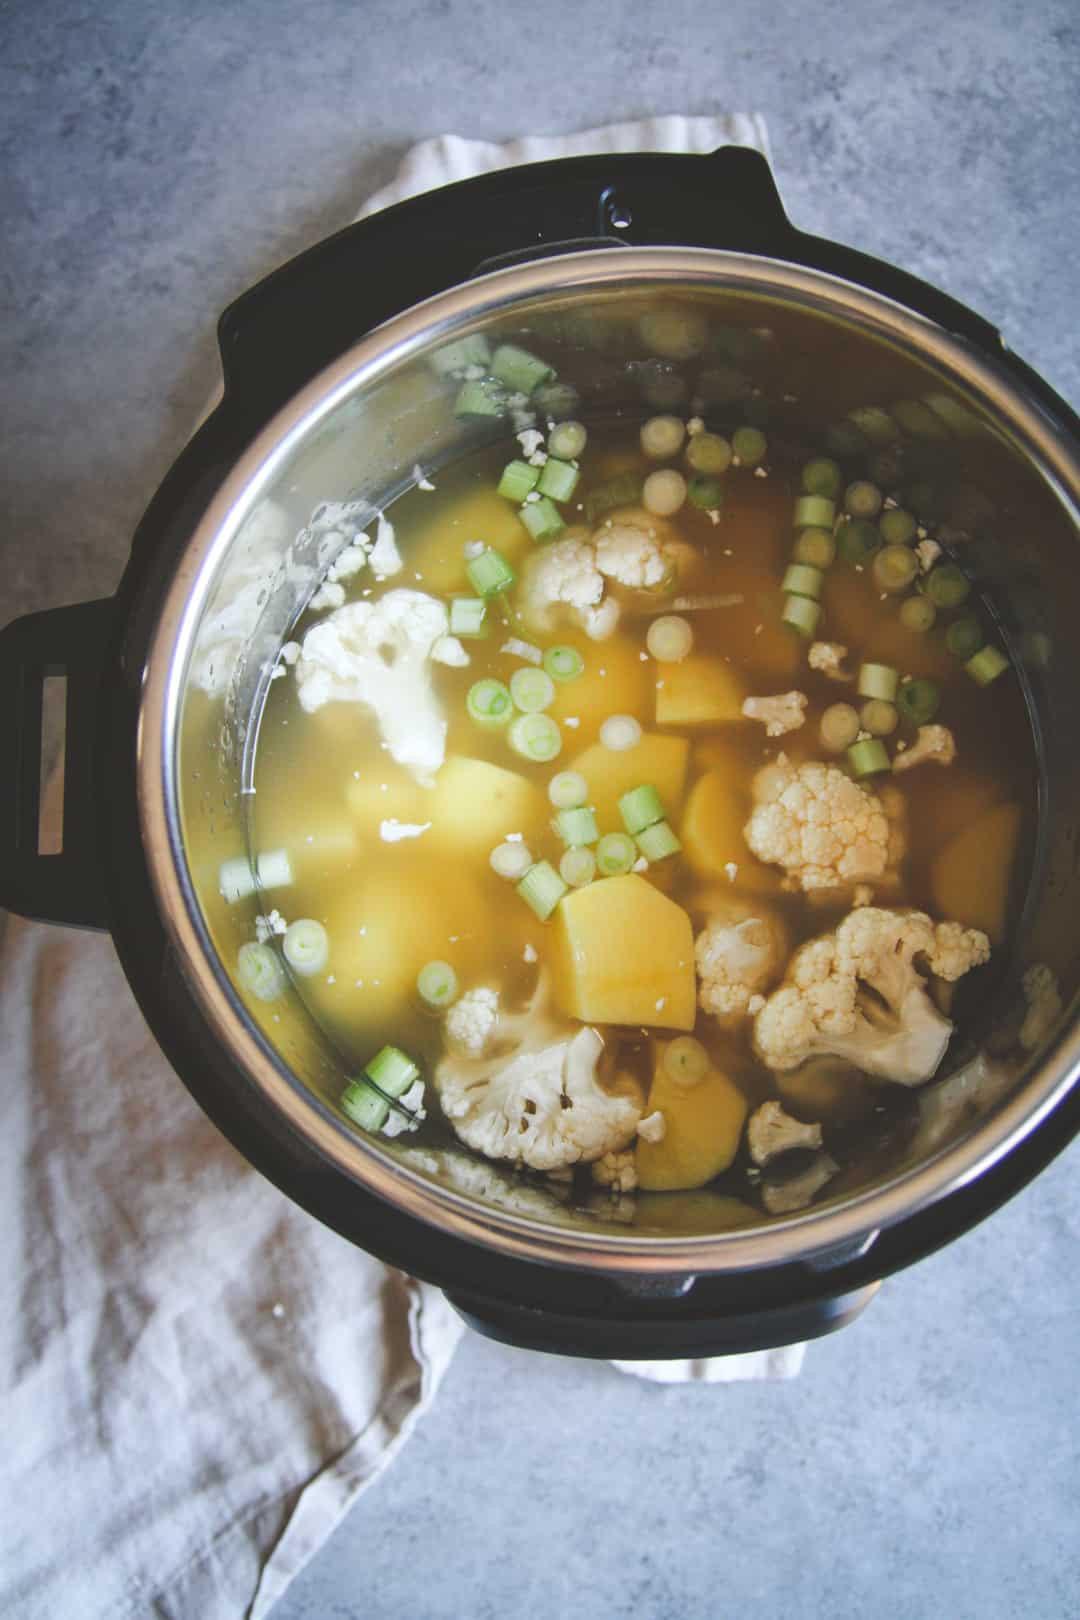 Healthy Instant Pot Soup Recipes  The Best Healthy Instant Pot Baked Potato Soup Recipe